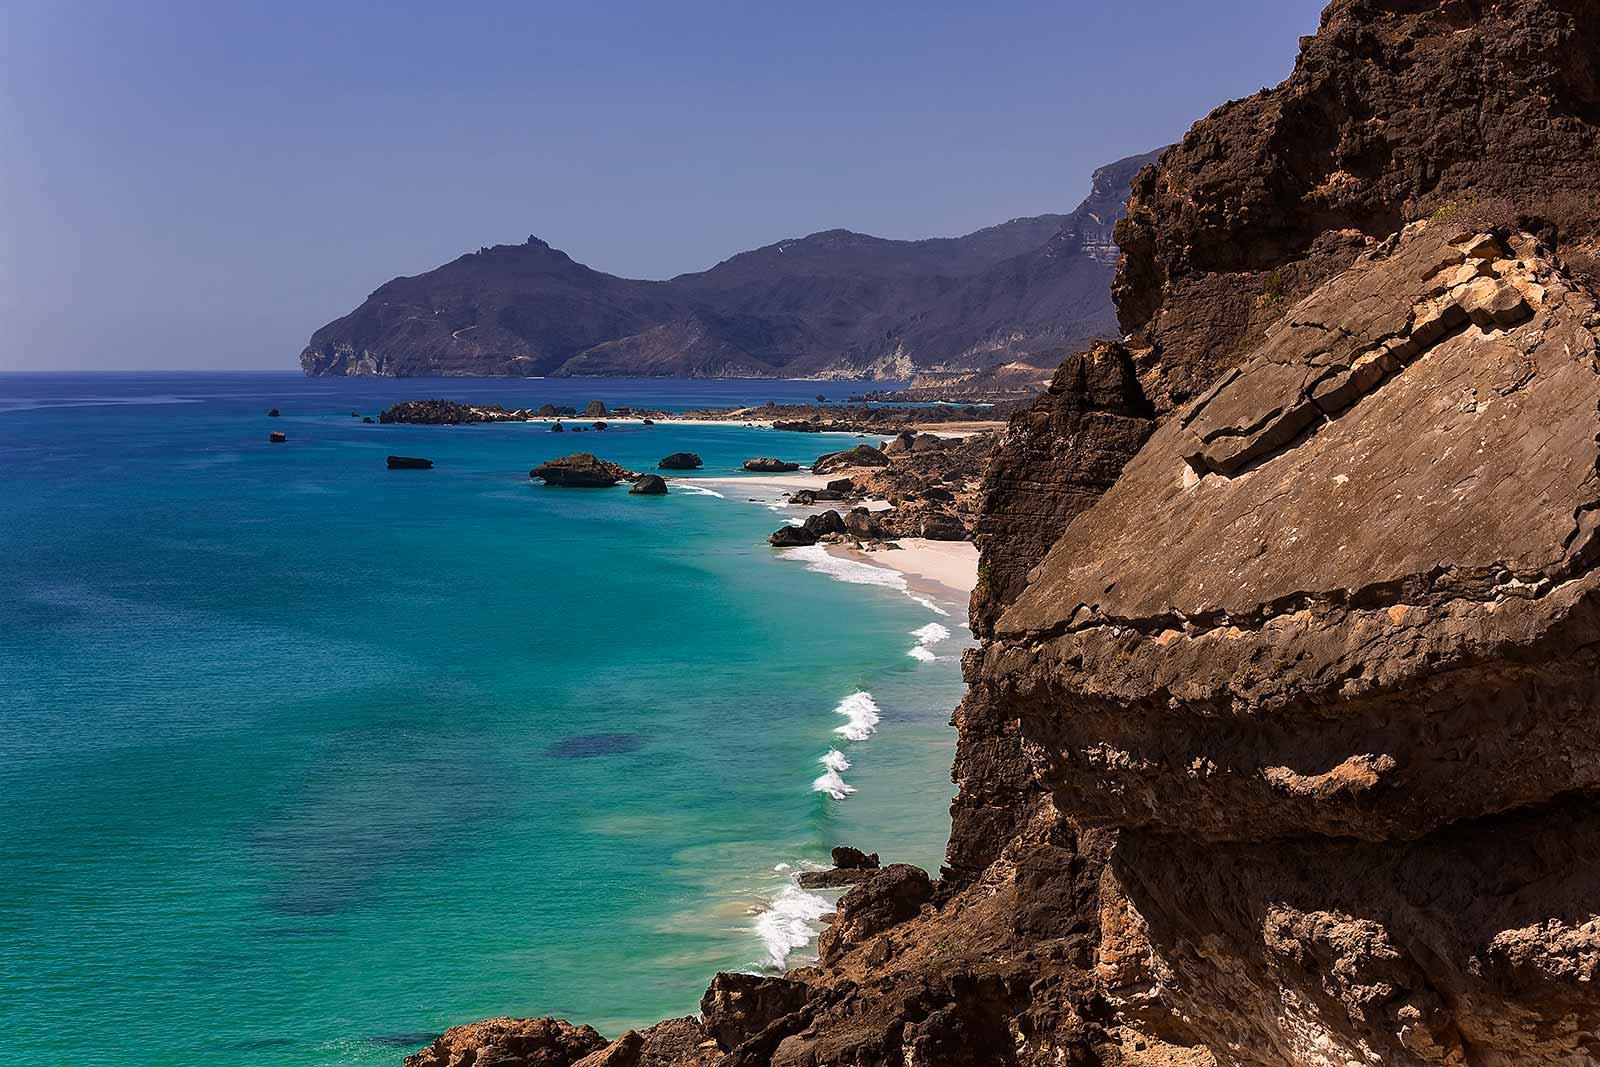 beach-landscape-east-salalah-oman